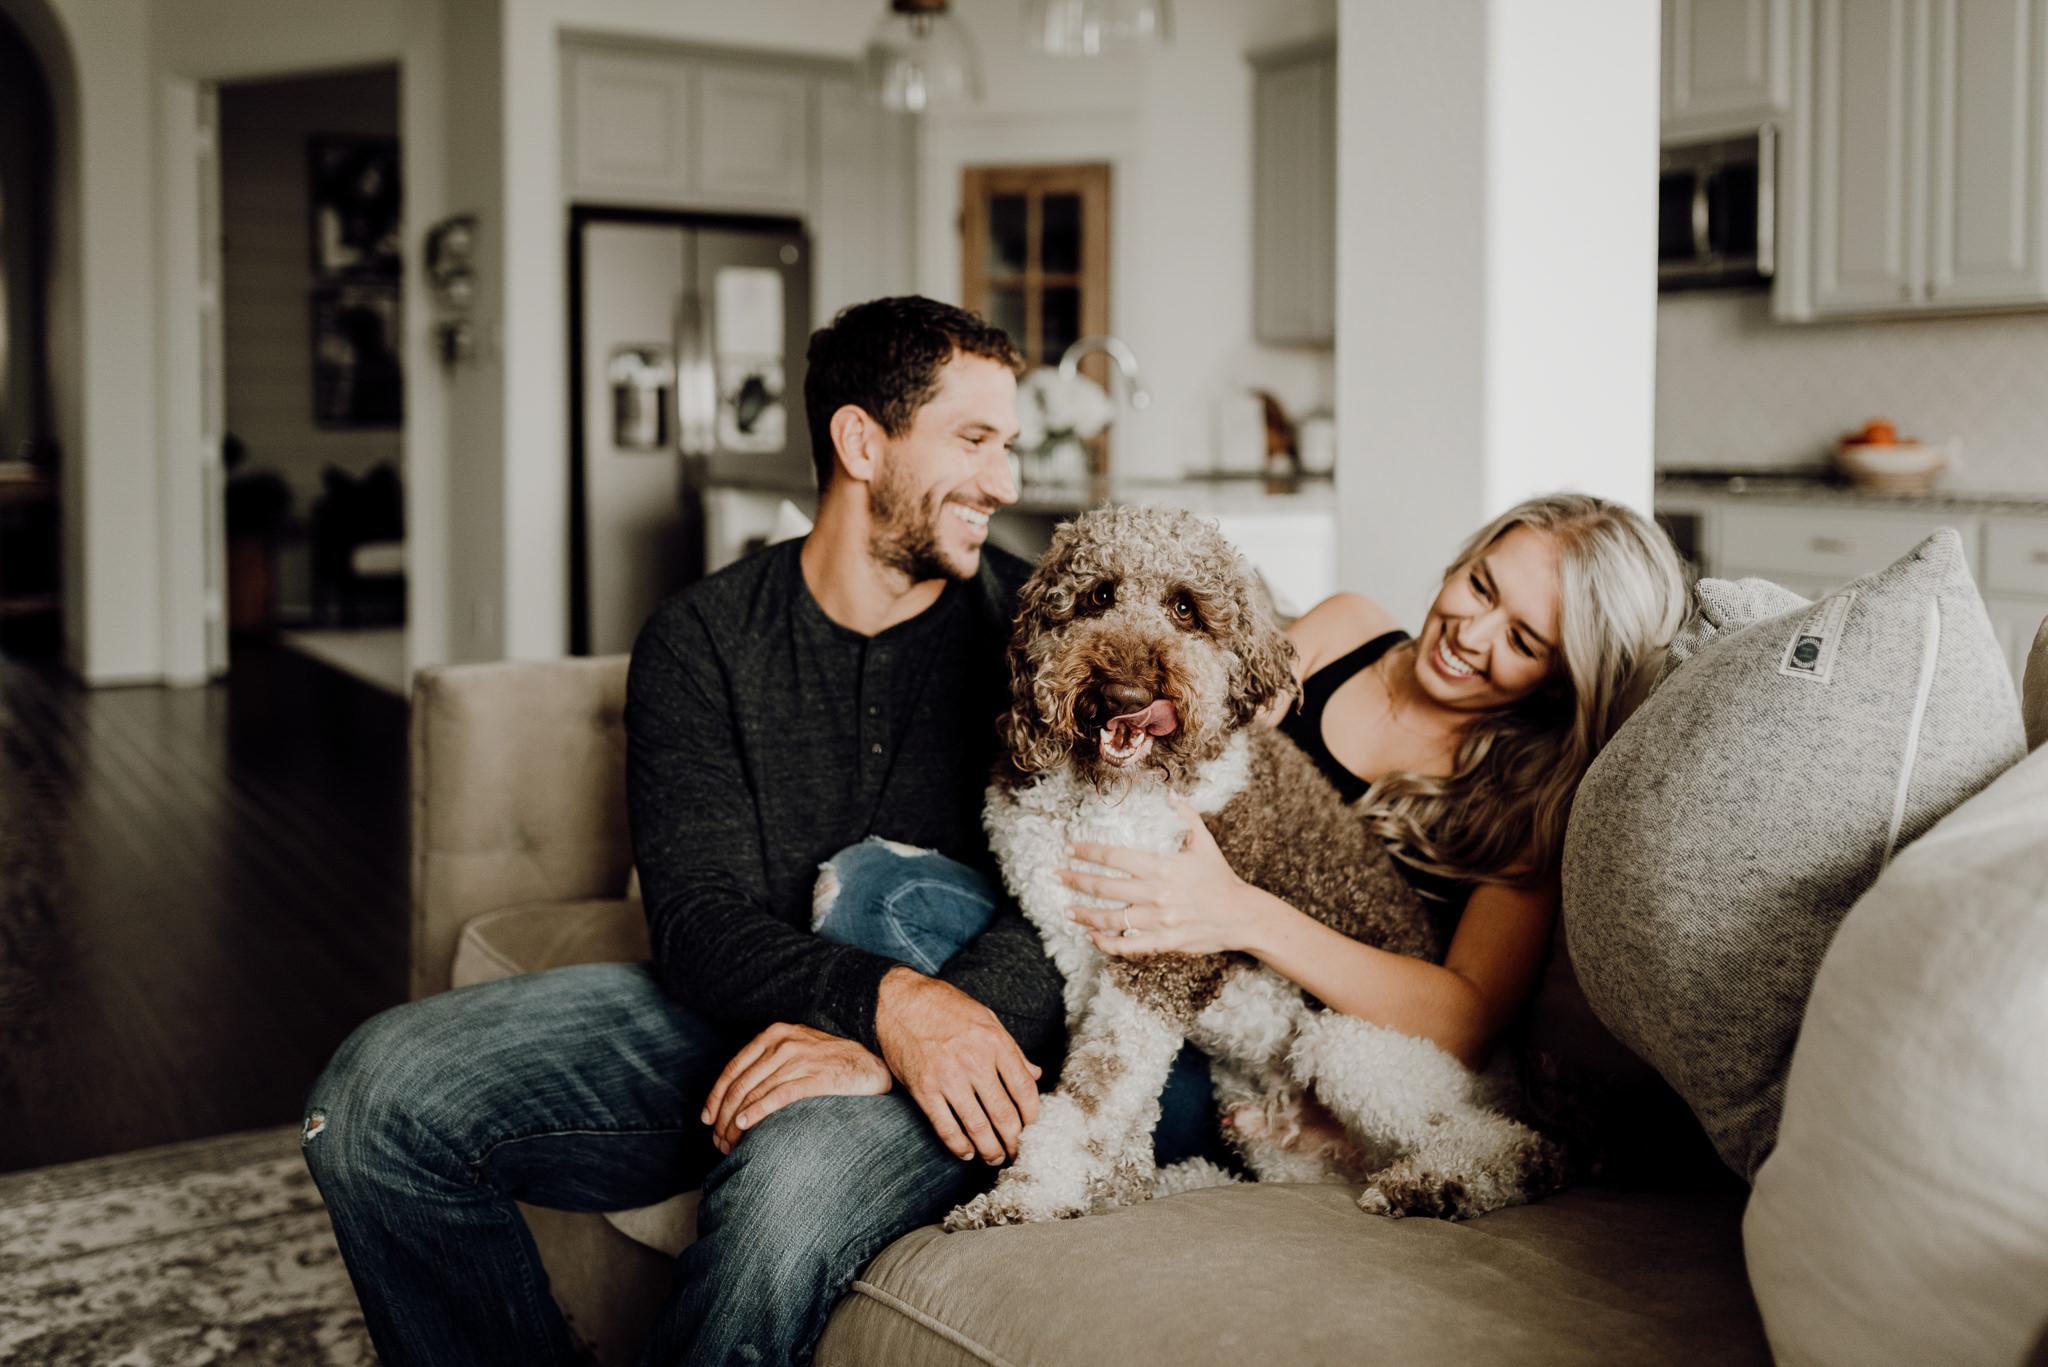 Houston Wedding Photographer-Houston In Home Engagement Session- Houston Wedding Photographer -Kristen Giles Photography-5.jpg